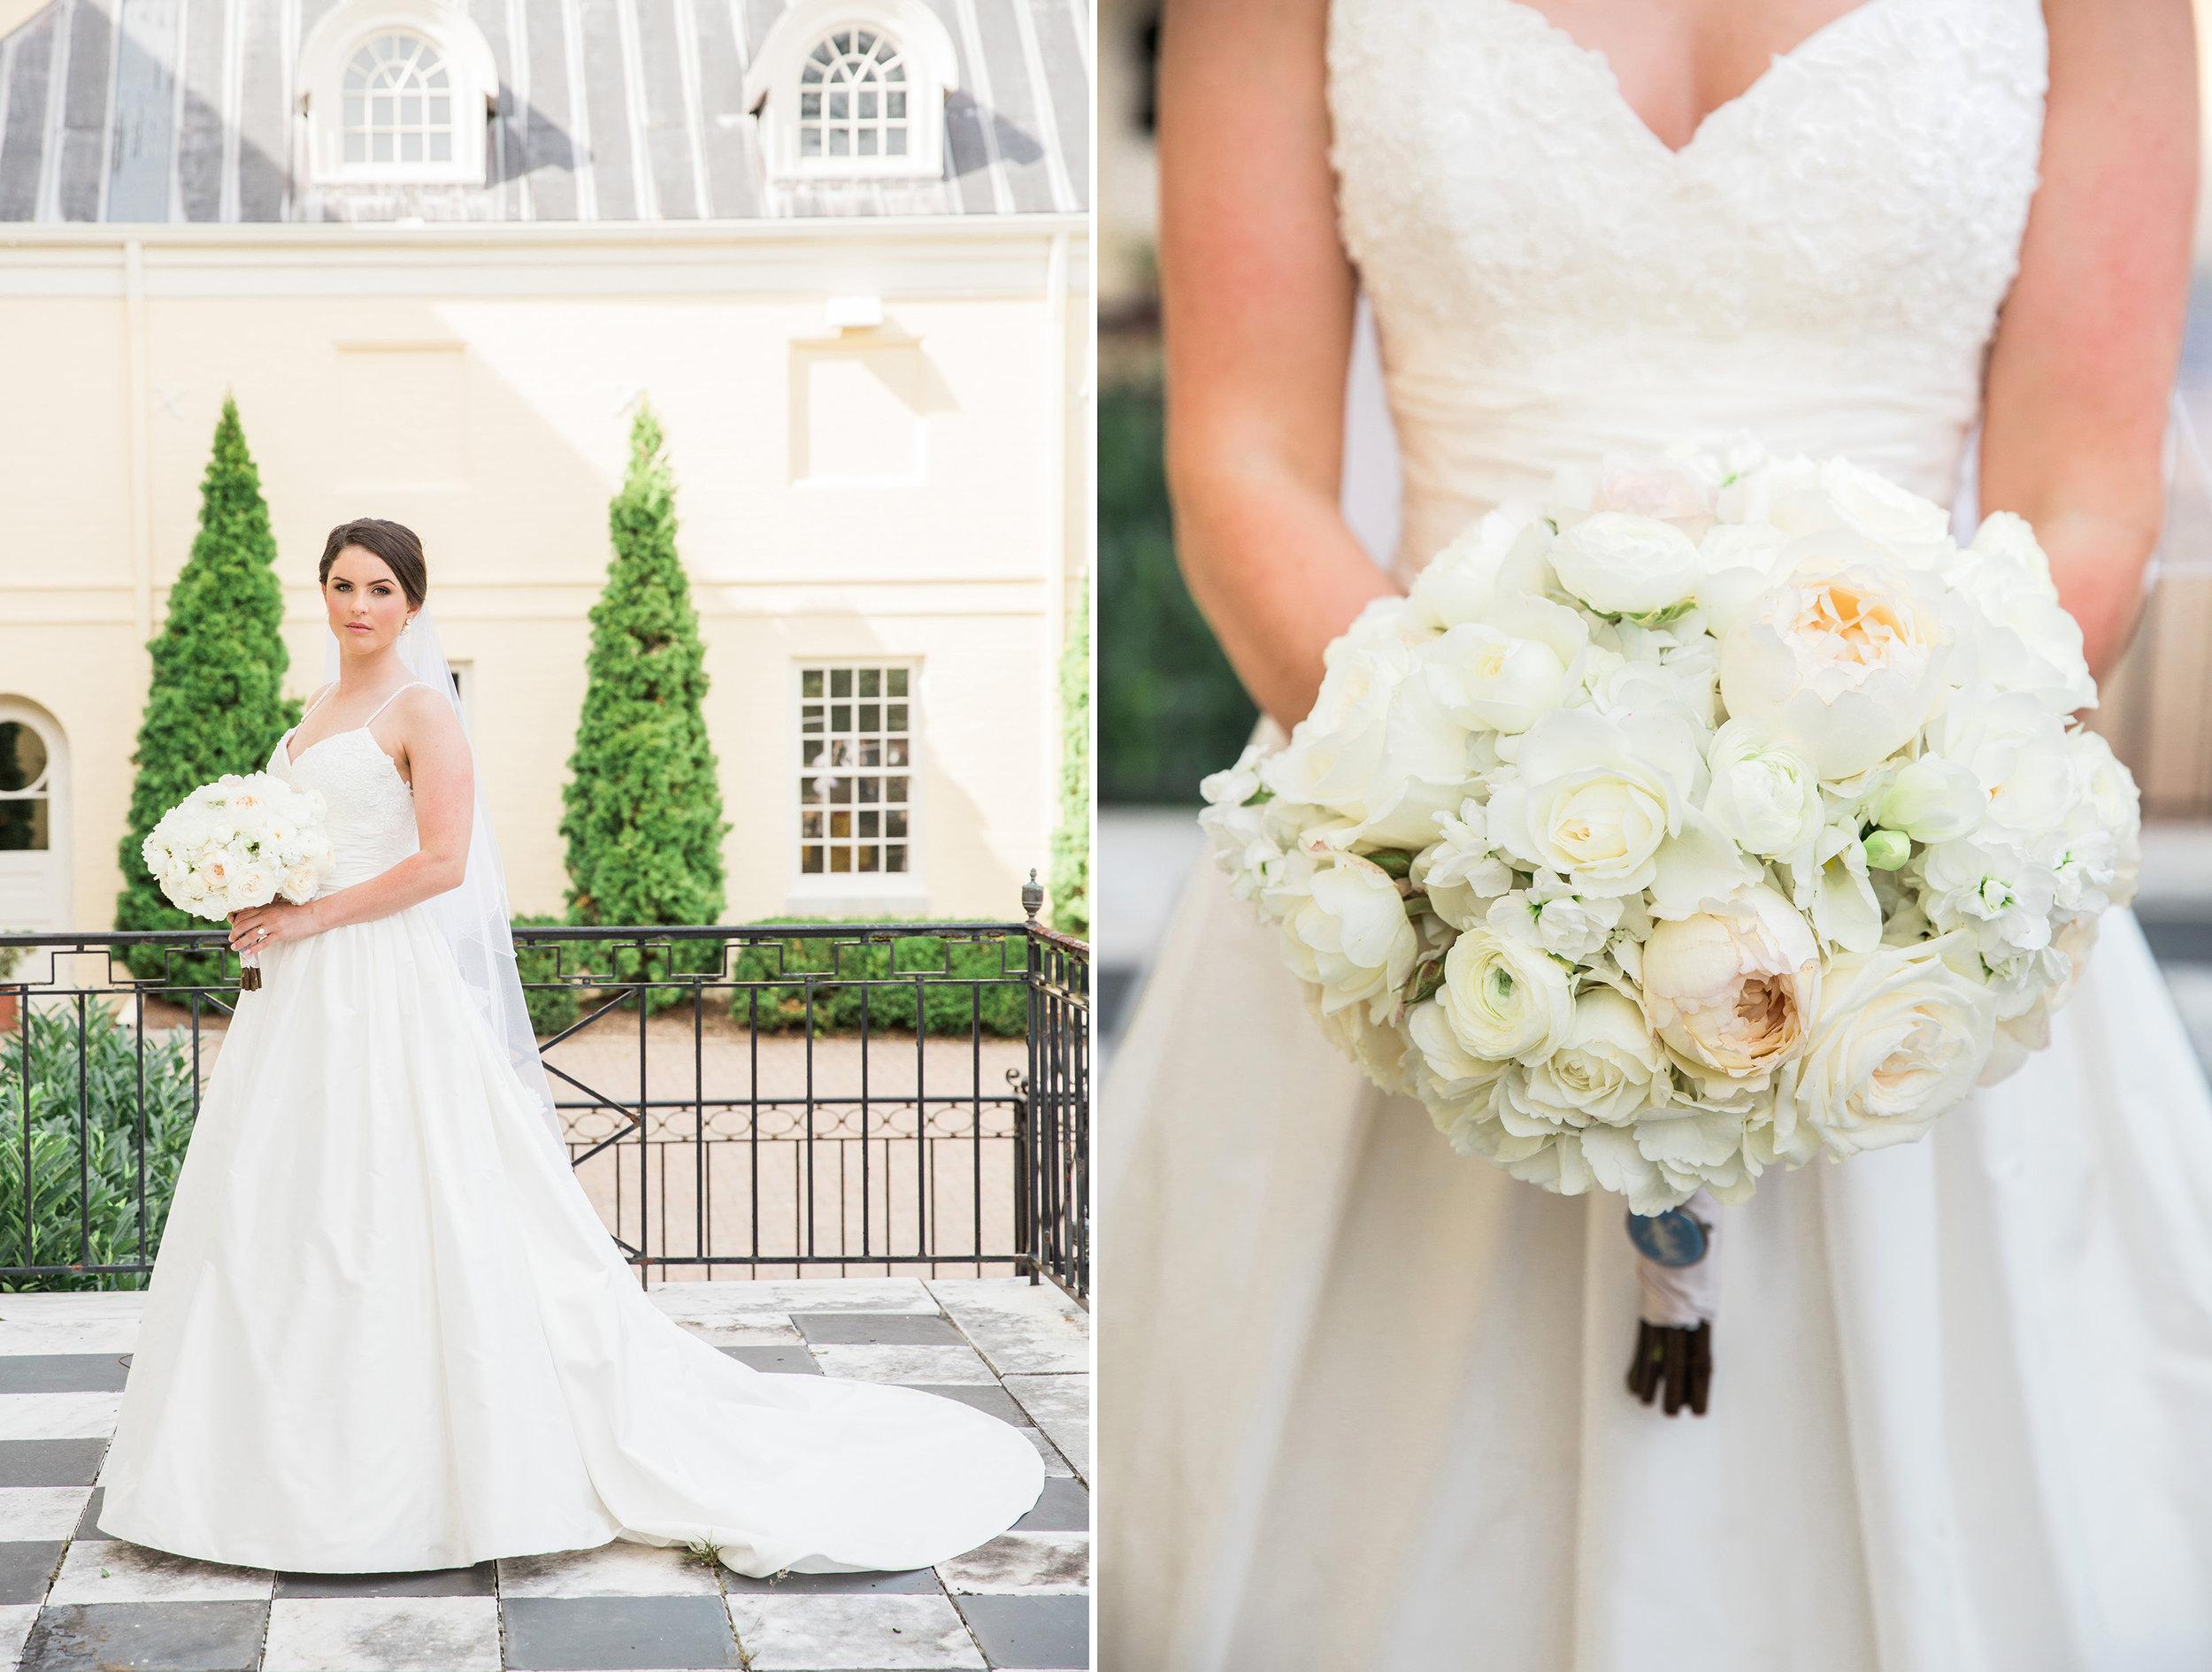 Evergreen-Museum-Balitmore-Maryland-Wedding-Black-Tie-Bride-017.jpg